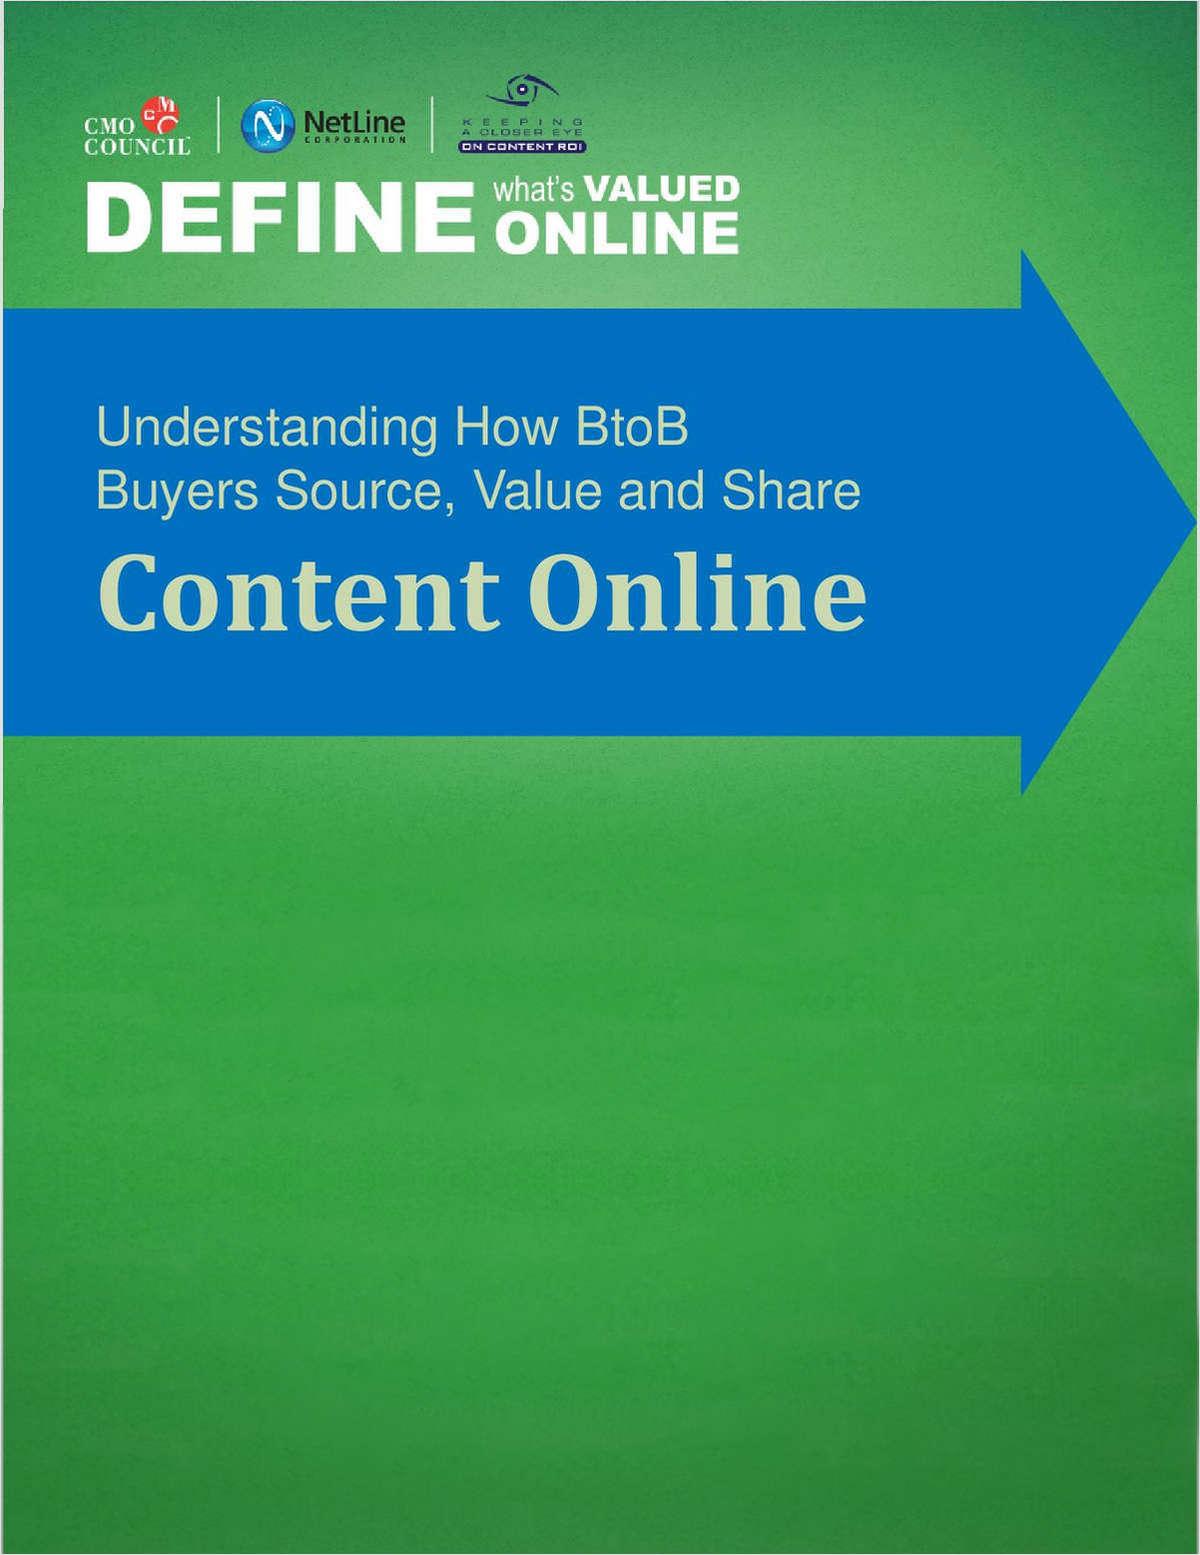 Define What's Valued Online: Understanding How BtoB Buyers Source, Value and Share Content Online